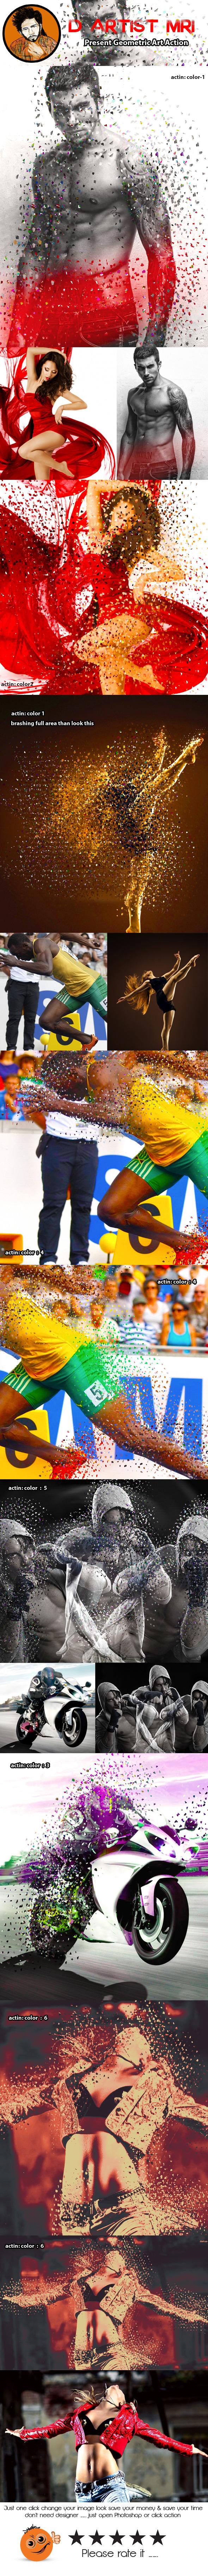 Color Full Dispertion